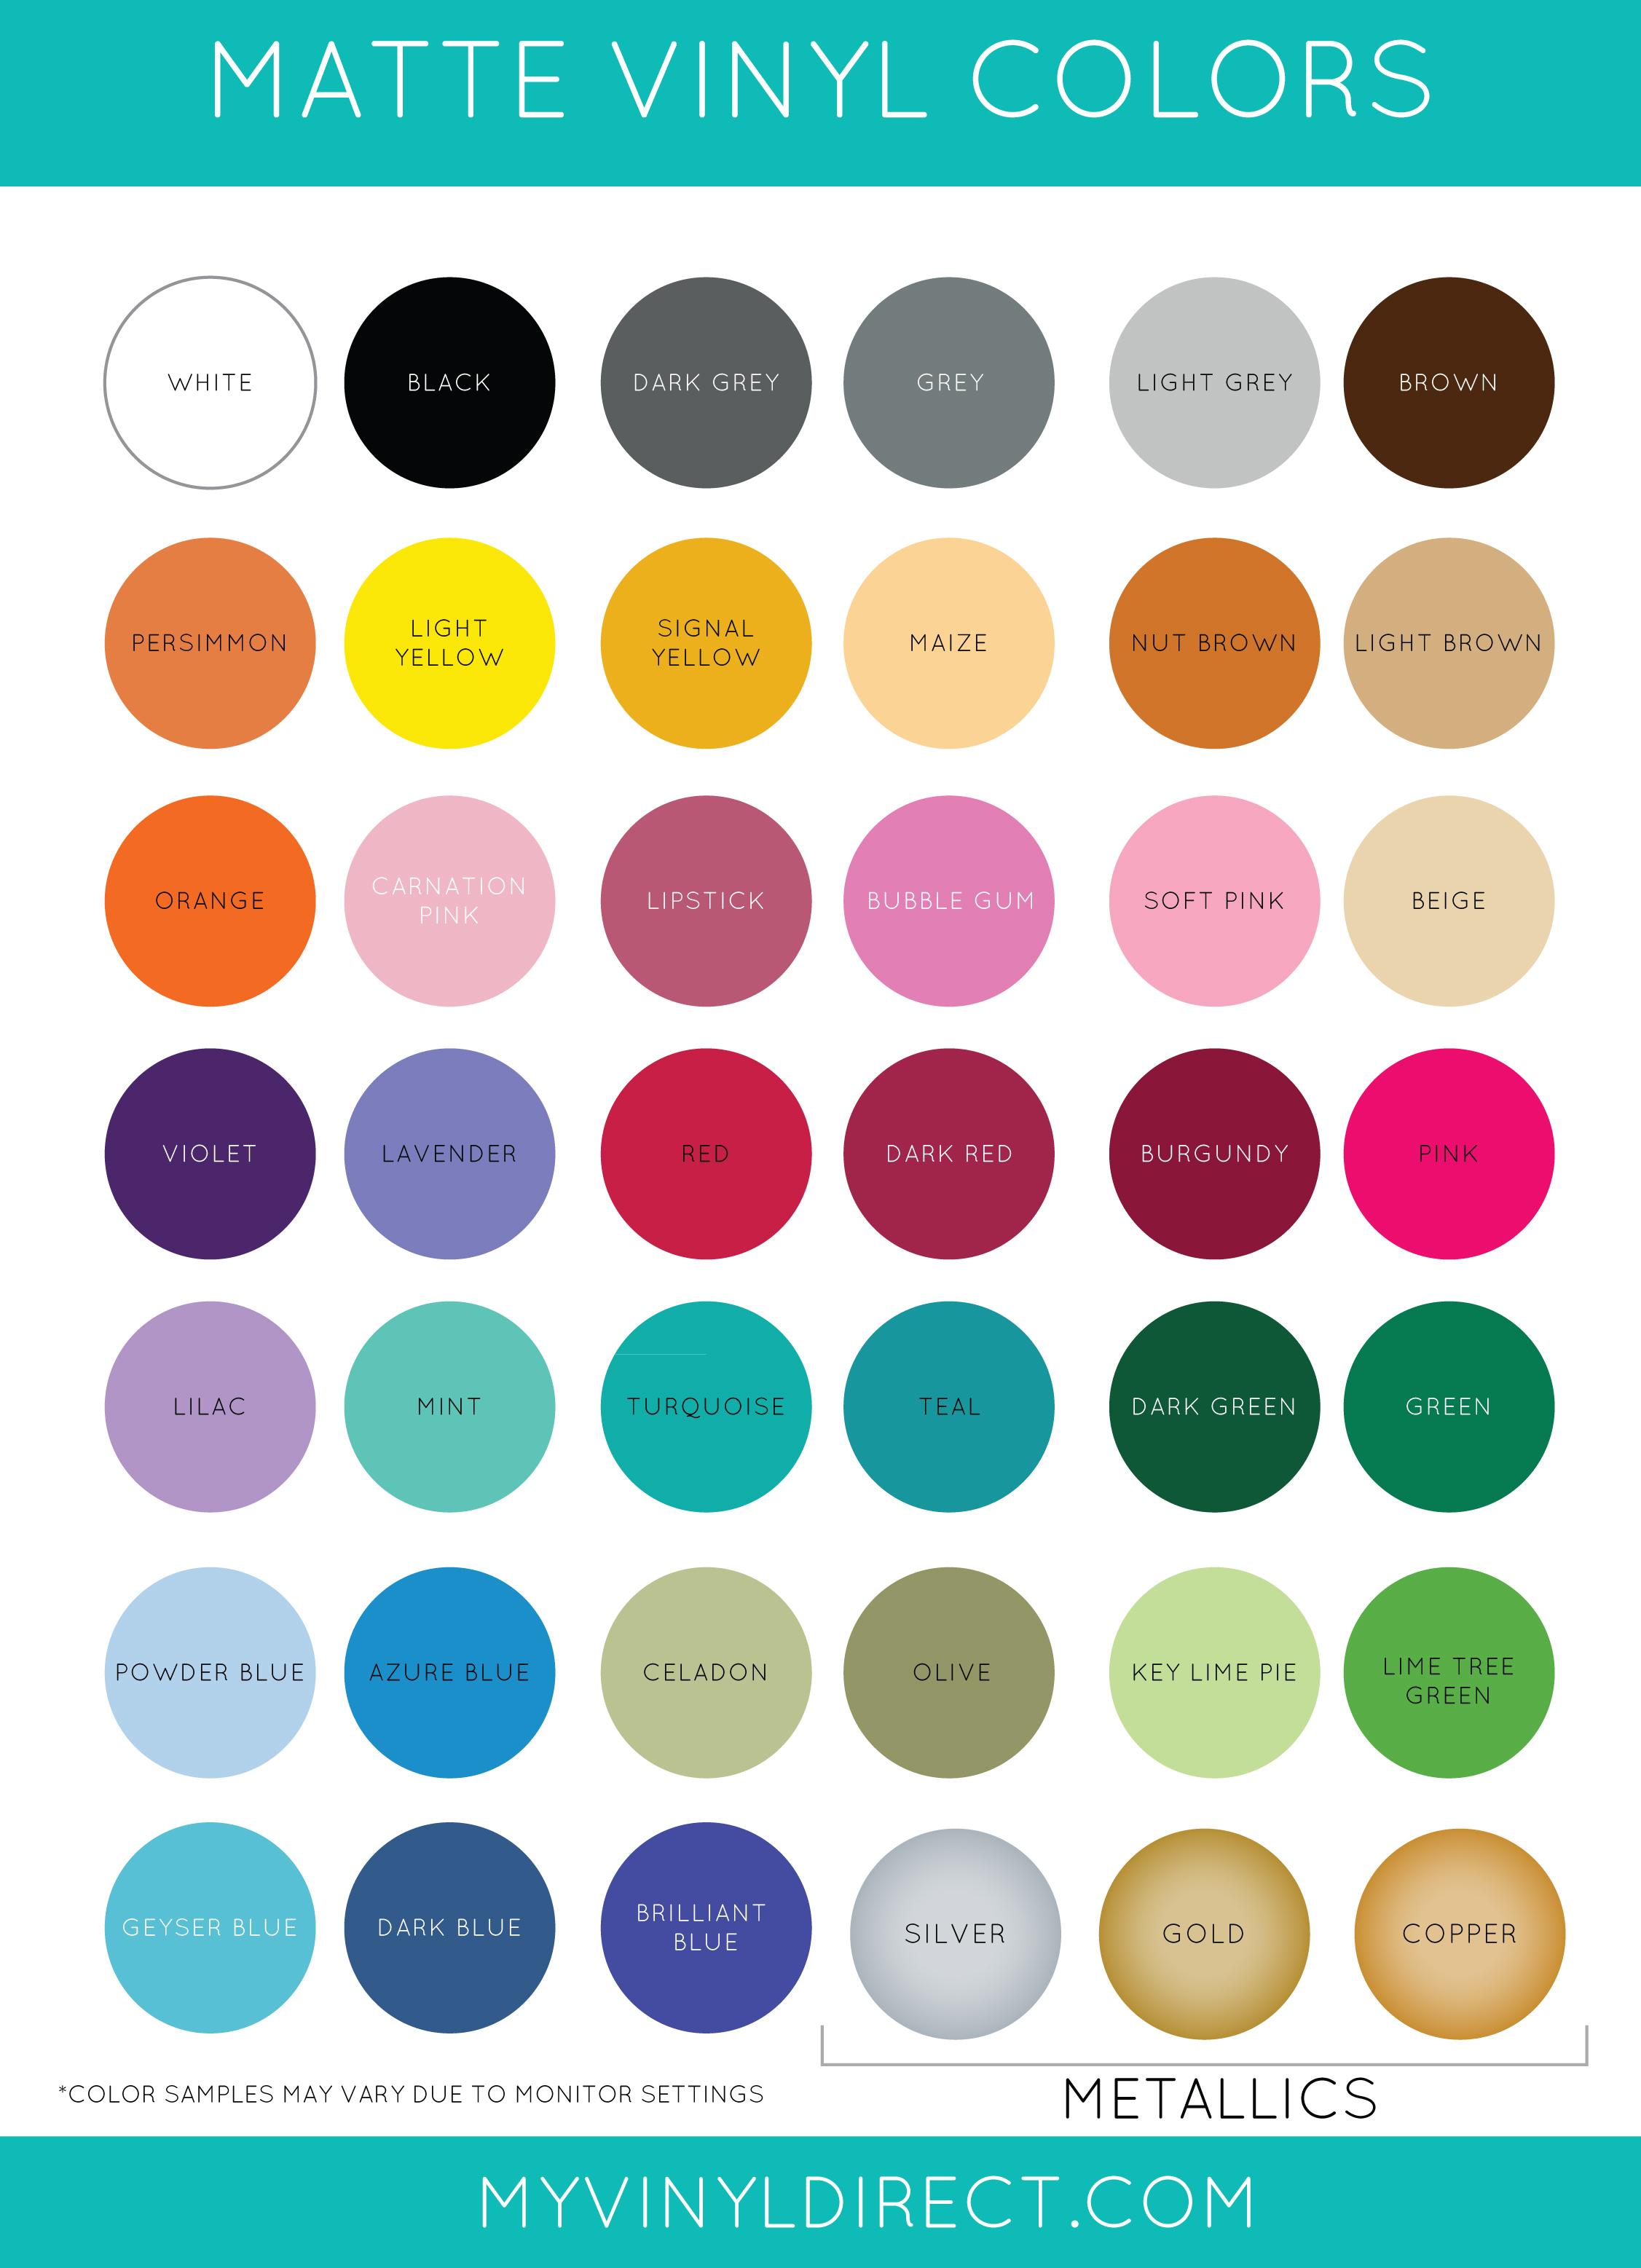 matte-color-chart-myvinyldirect-2015.jpg